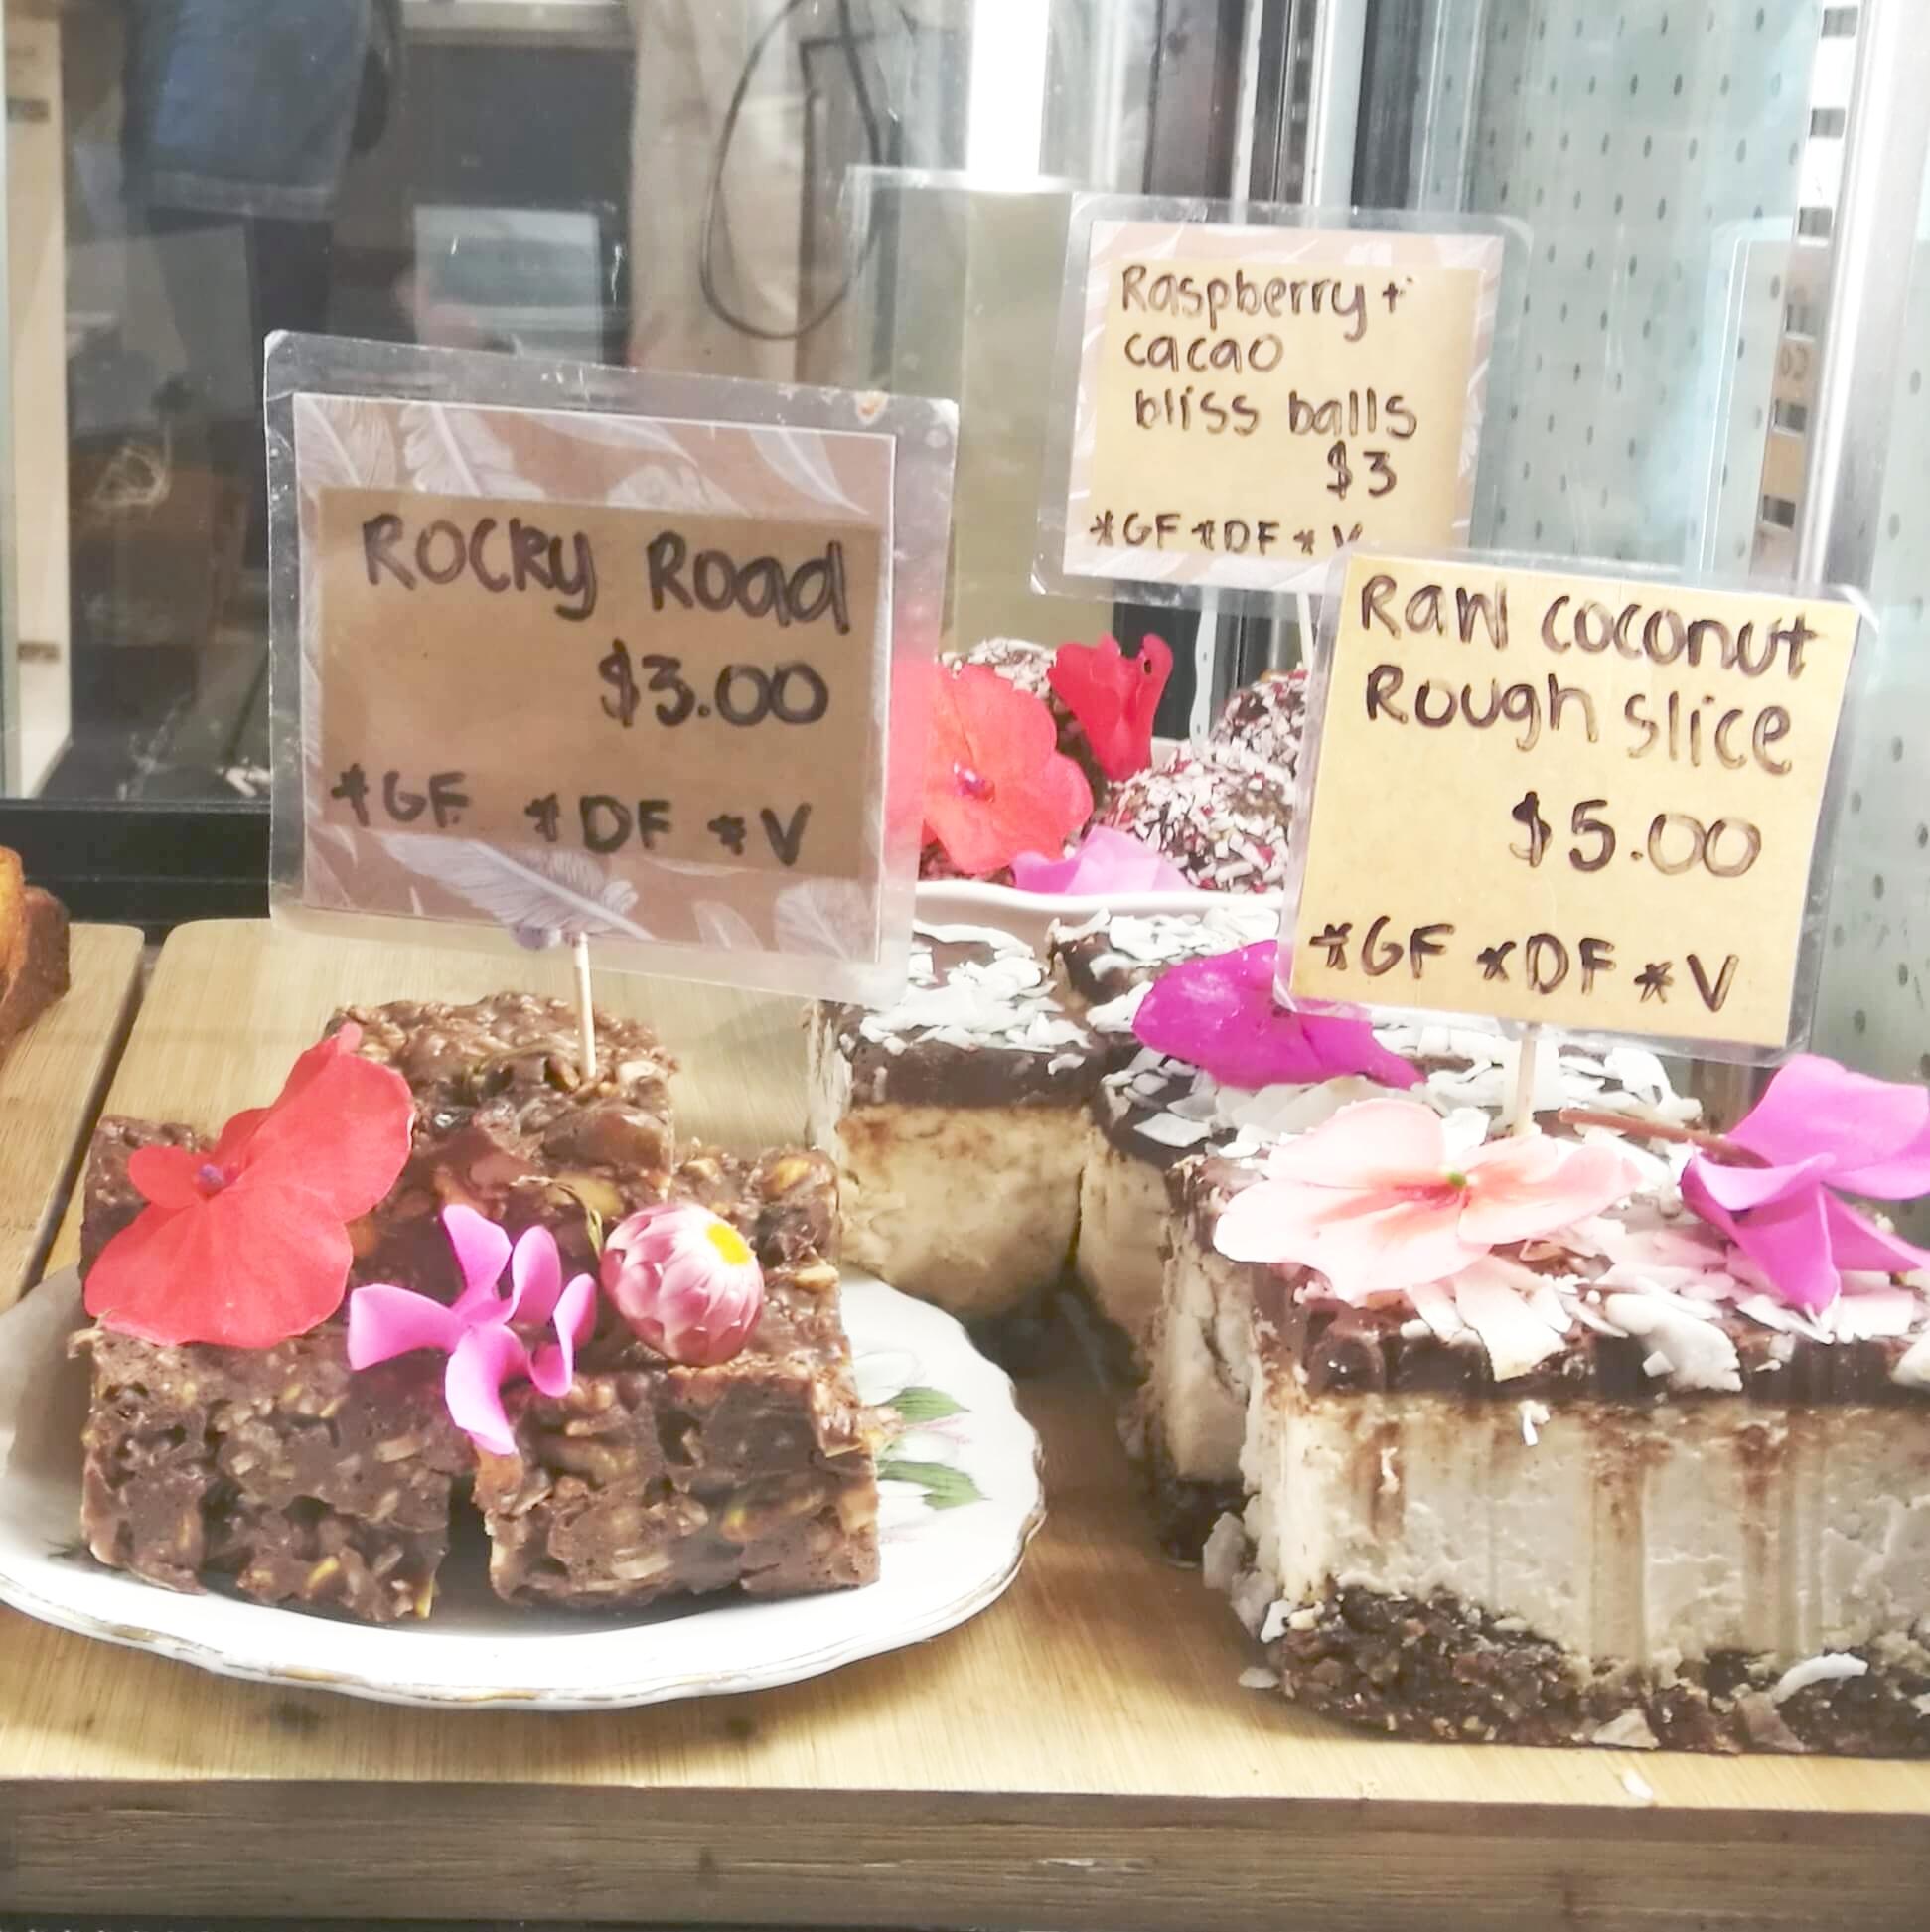 The beautiful vegan treats I sampled earlier this year at  Patio Rose Cafe , Tauranga, New Zealand